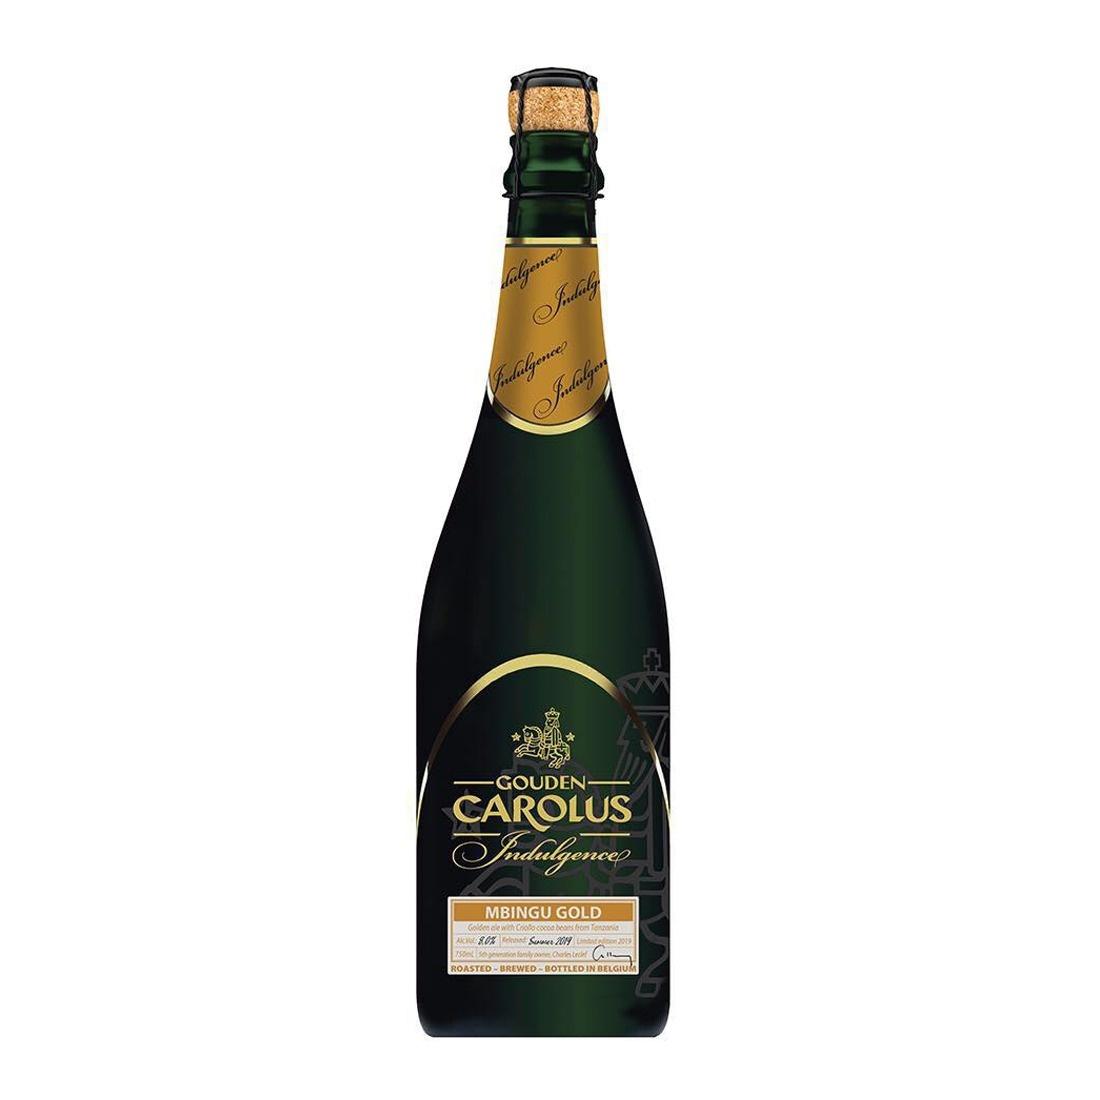 Anker Gouden Carolus - Indulgence Mbingu Gold 75cl